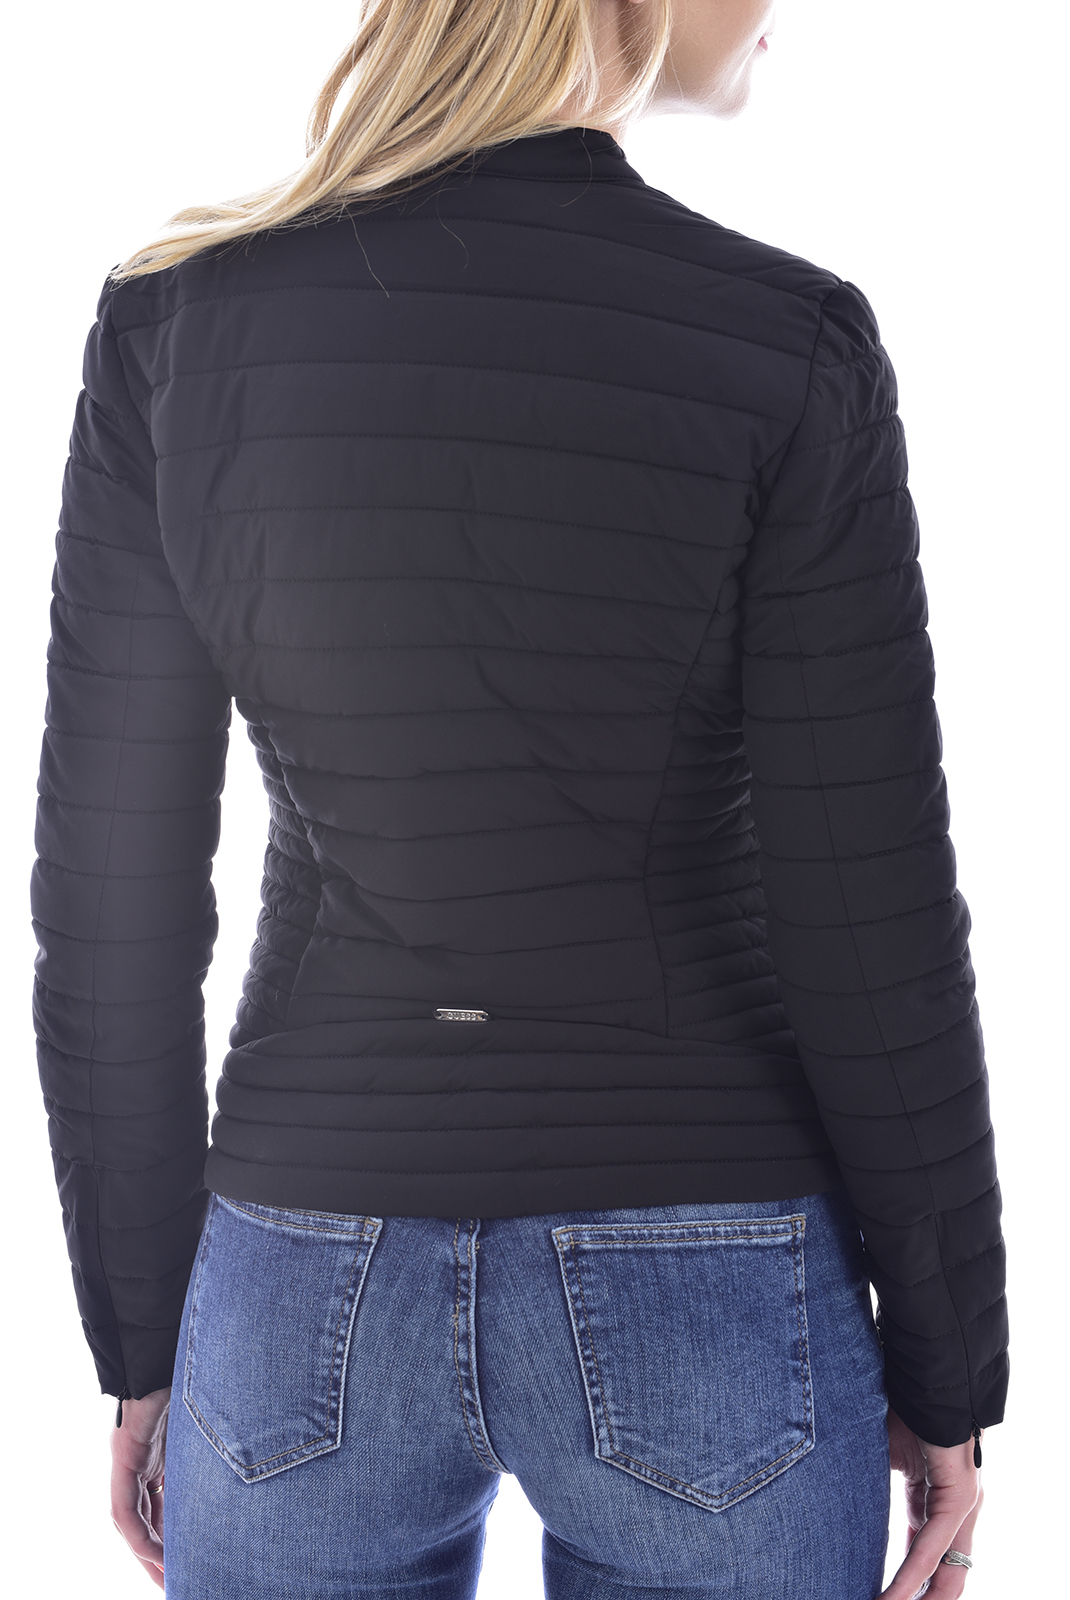 Blouson / doudoune  Guess jeans W0BL1IW6NW0 JBLK